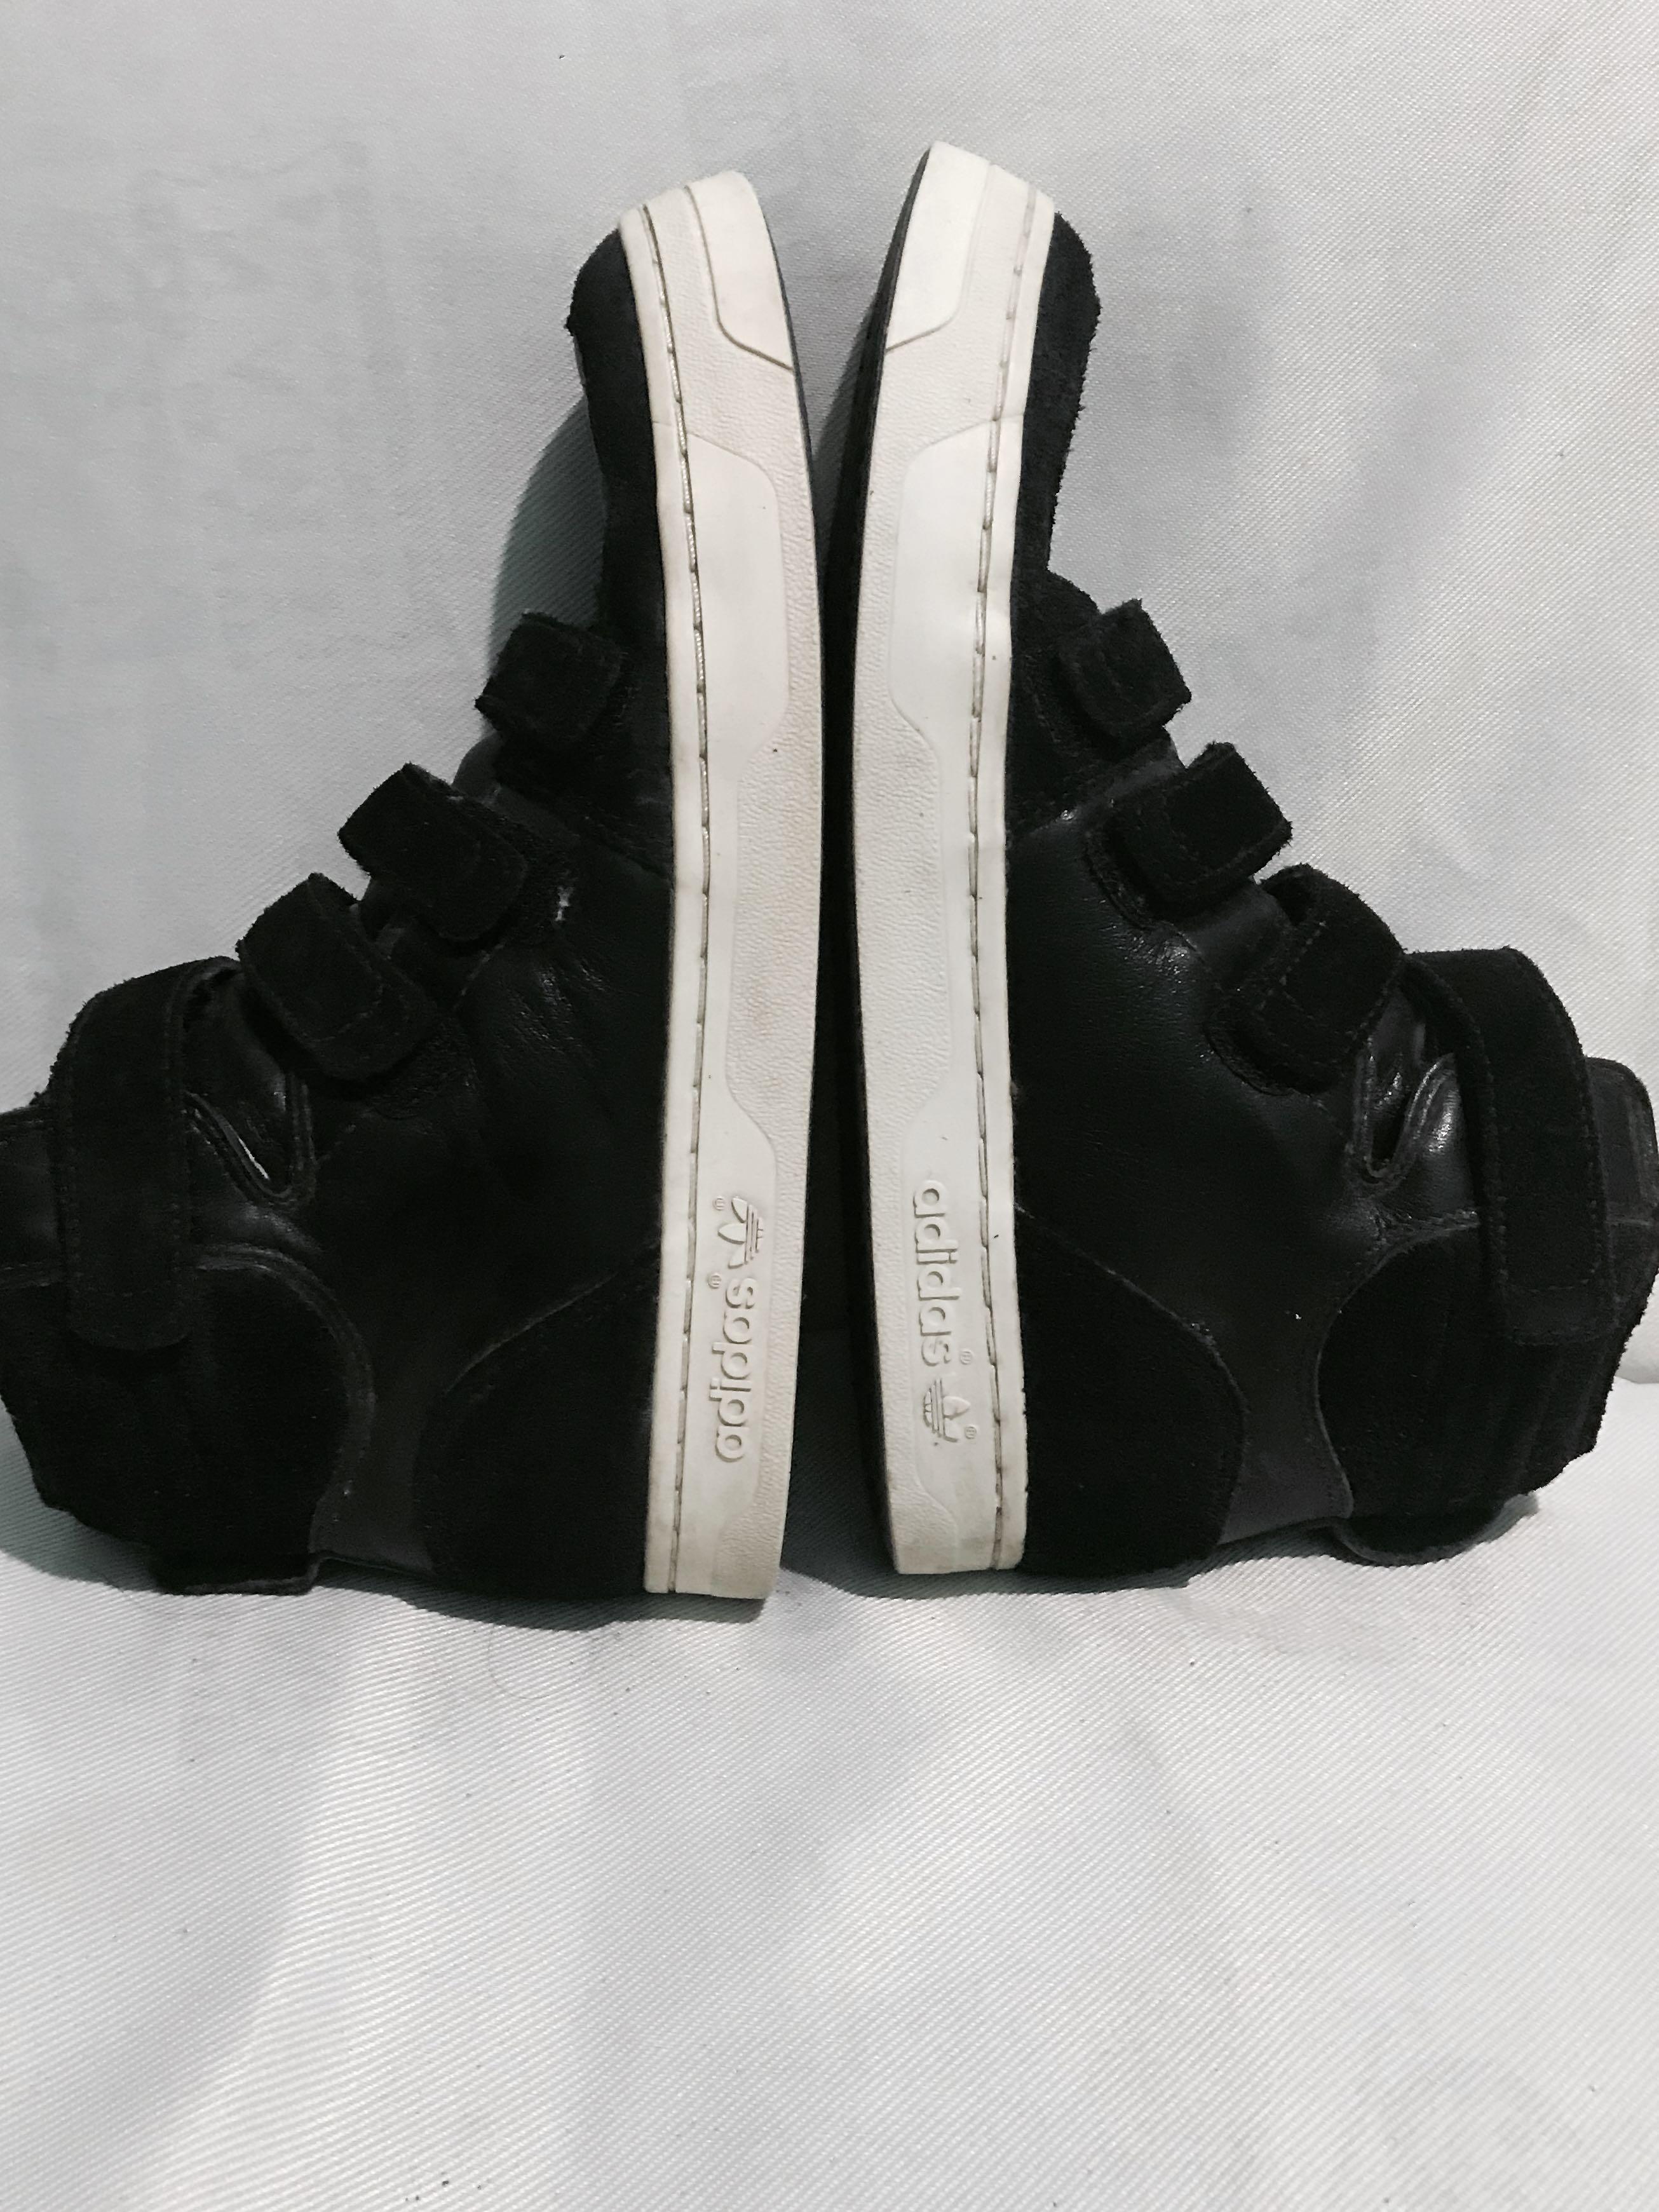 44f0941ea2 CutWomen s On Carousell Adidas FashionShoes Hi Okwn0P